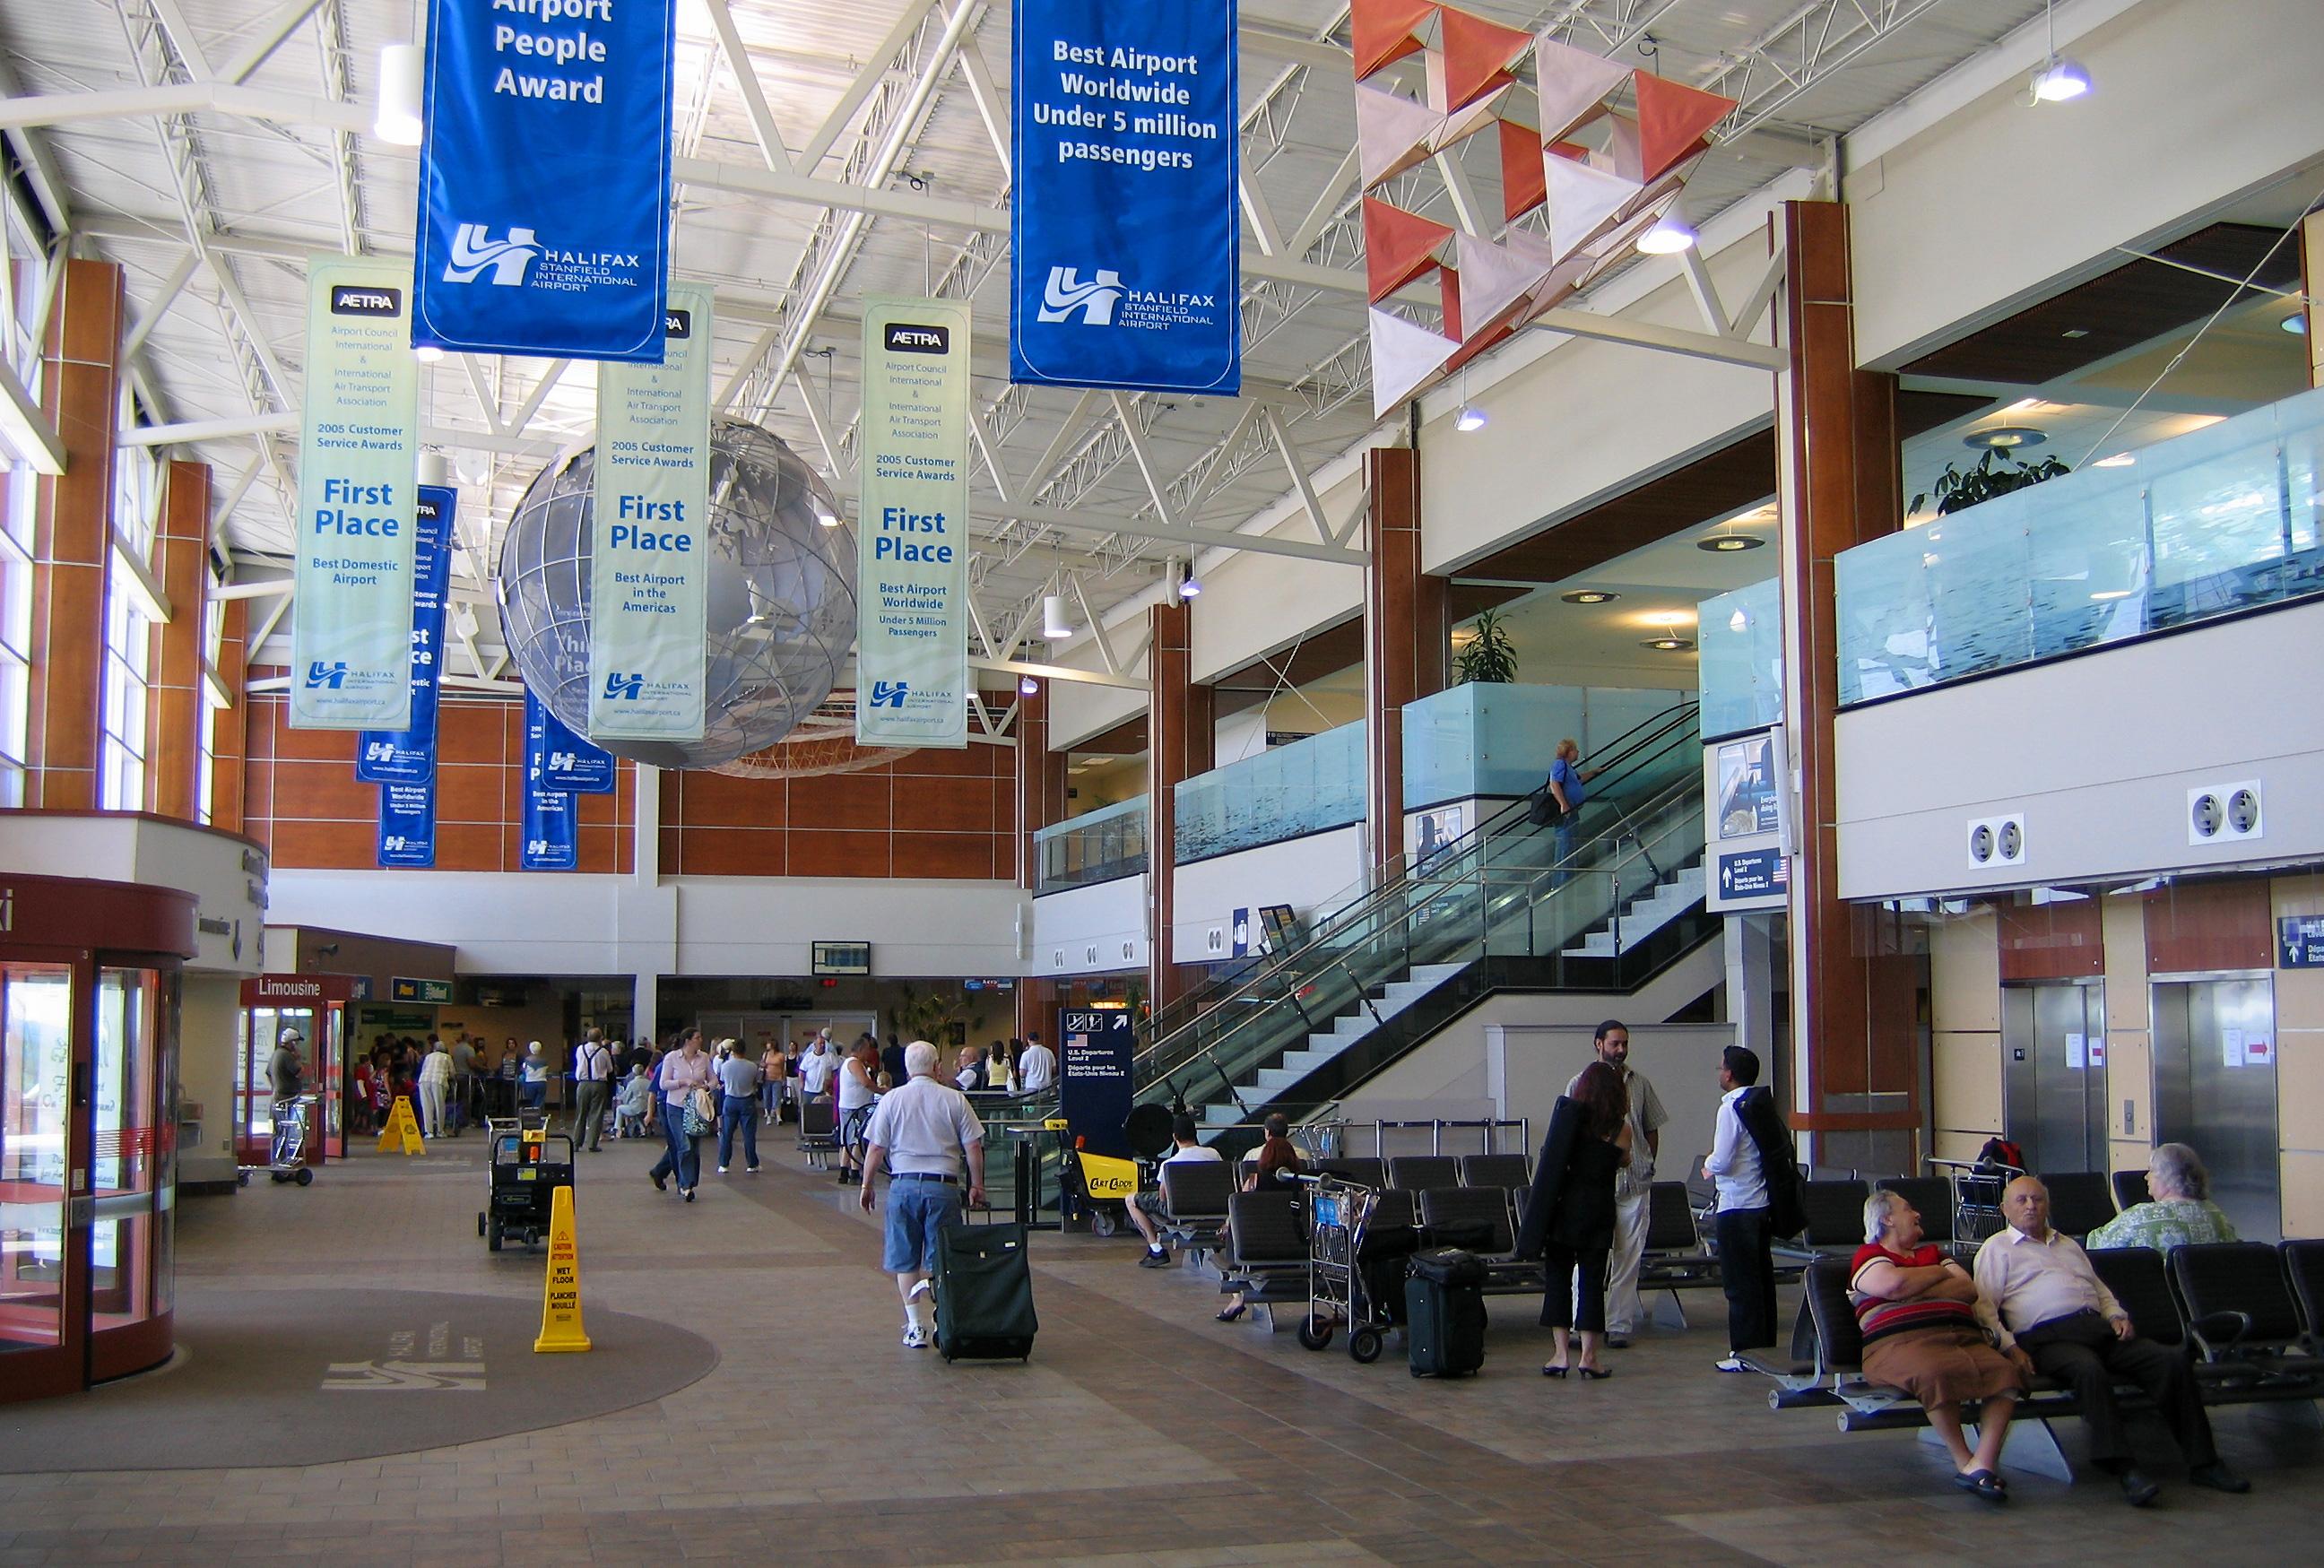 Airport of Halifax